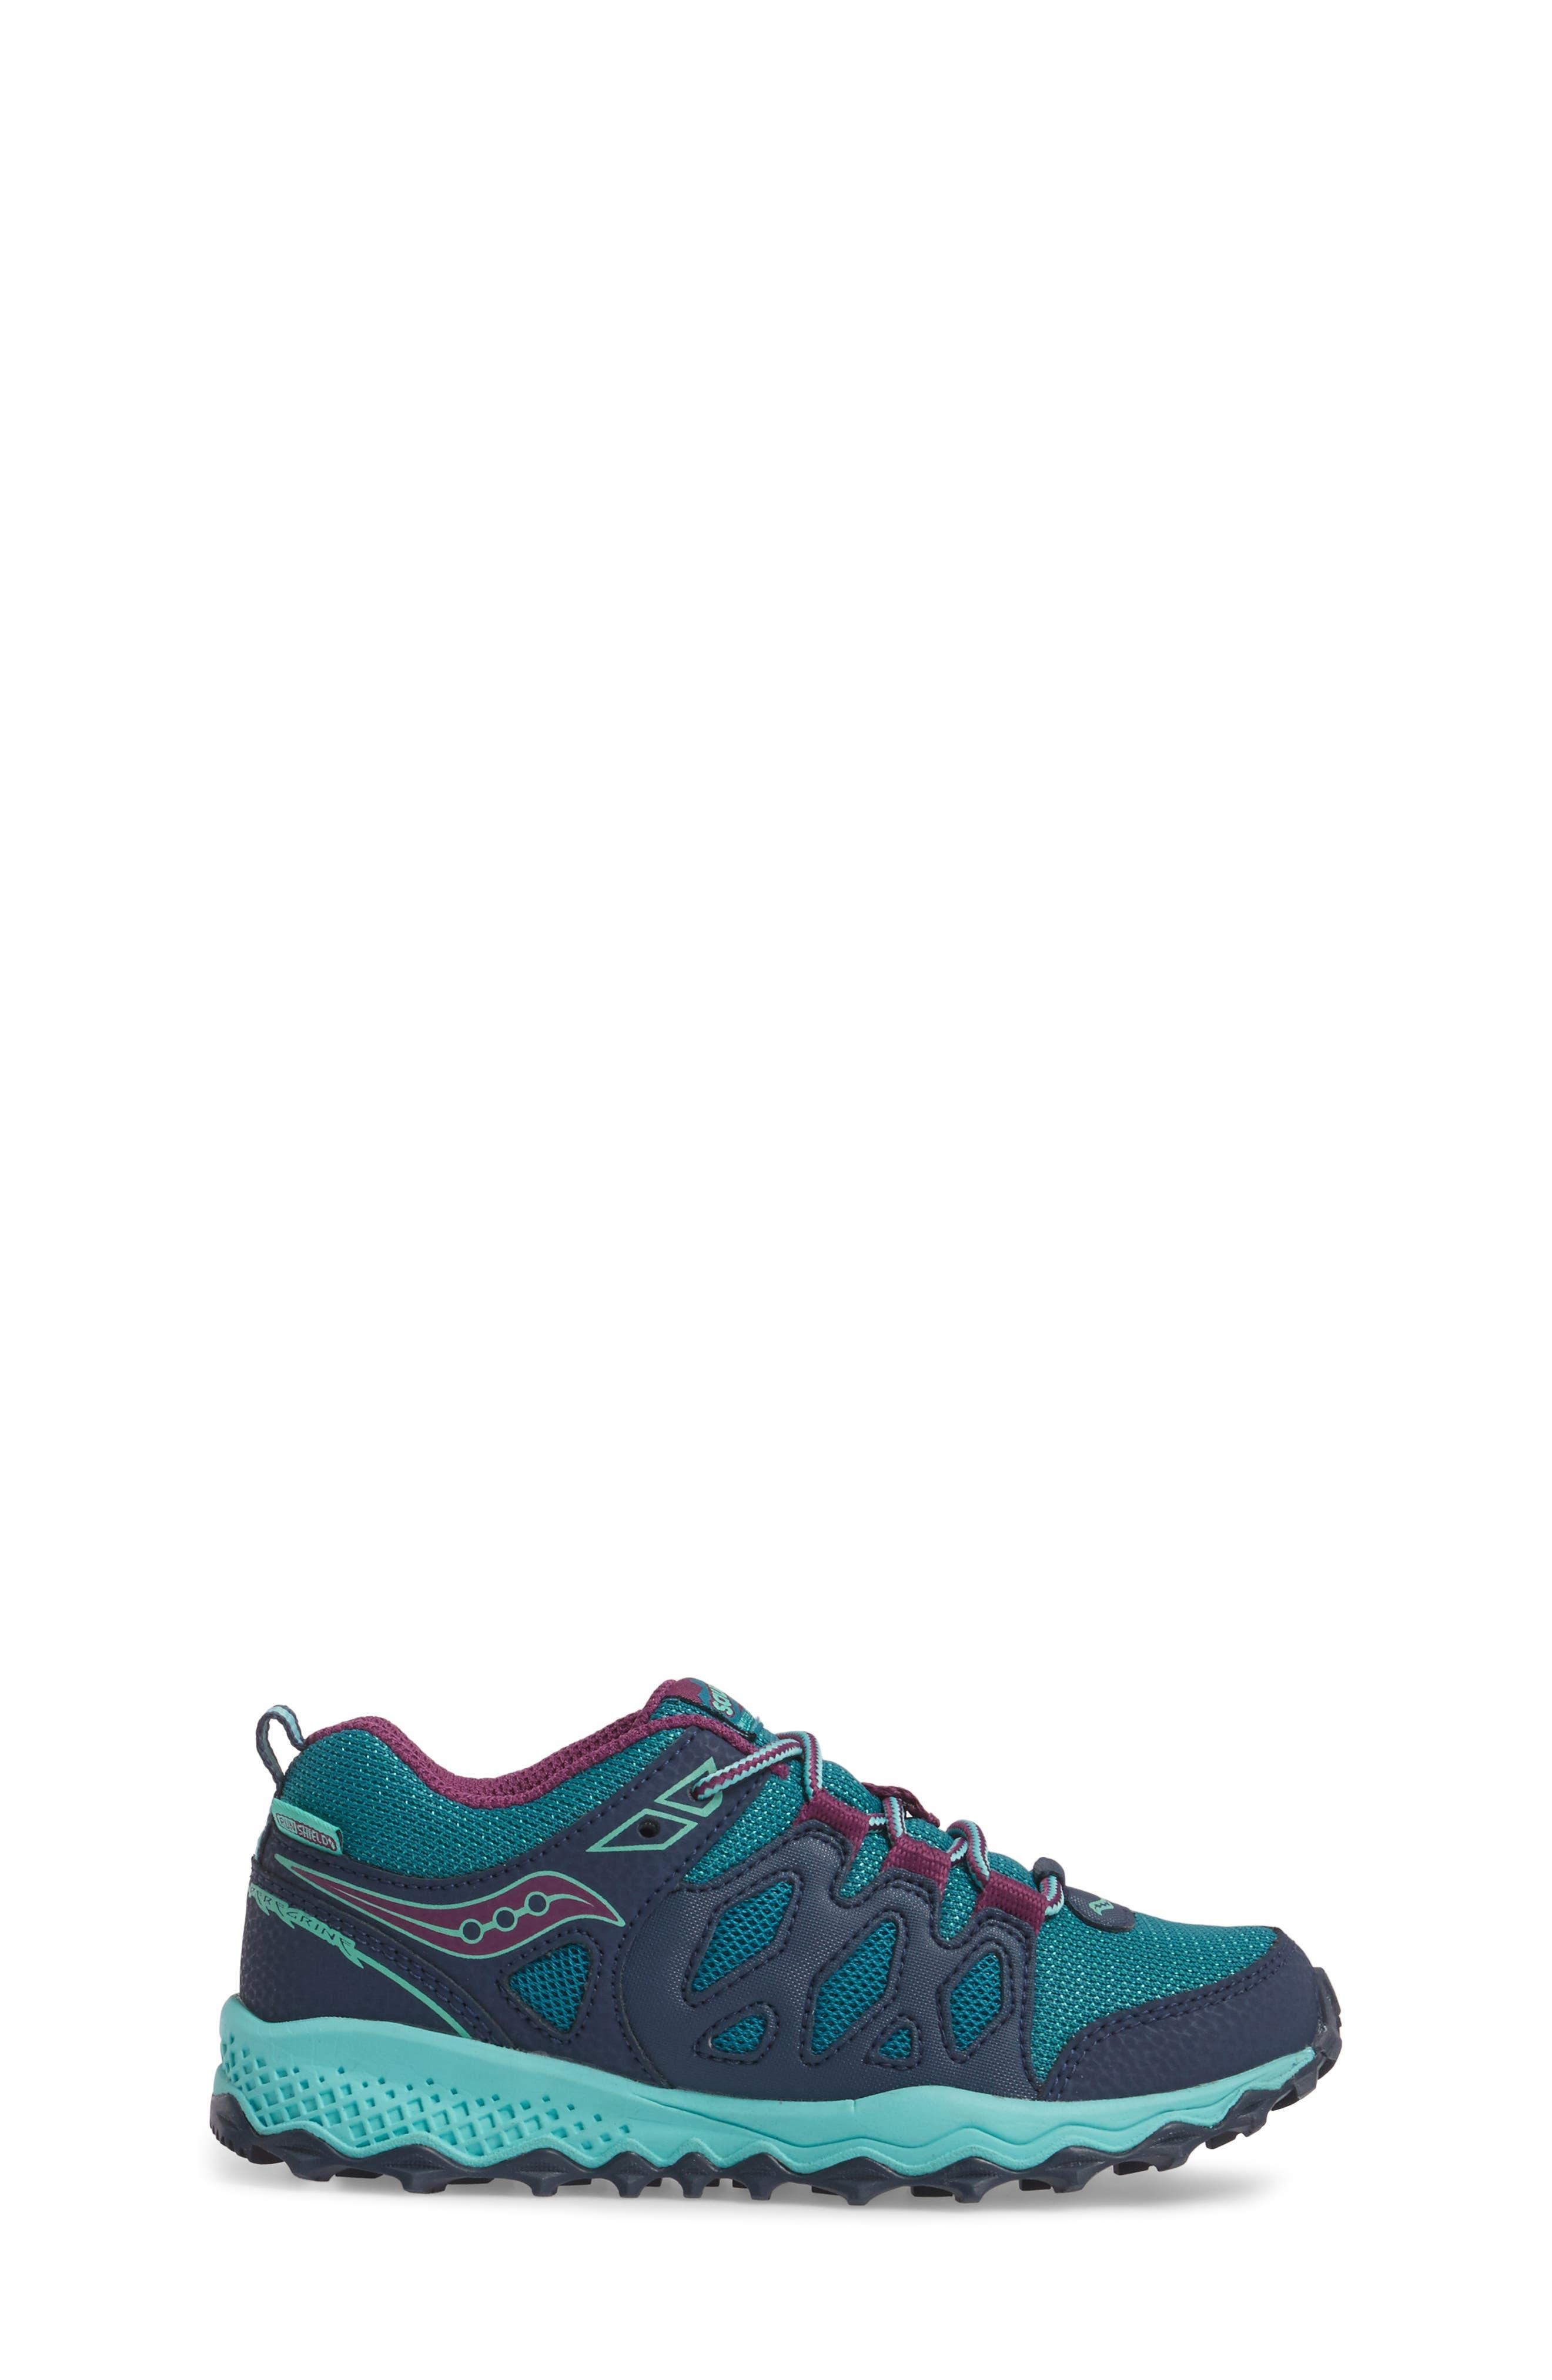 Peregrine Shield Water-Resistant Sneaker,                             Alternate thumbnail 3, color,                             440